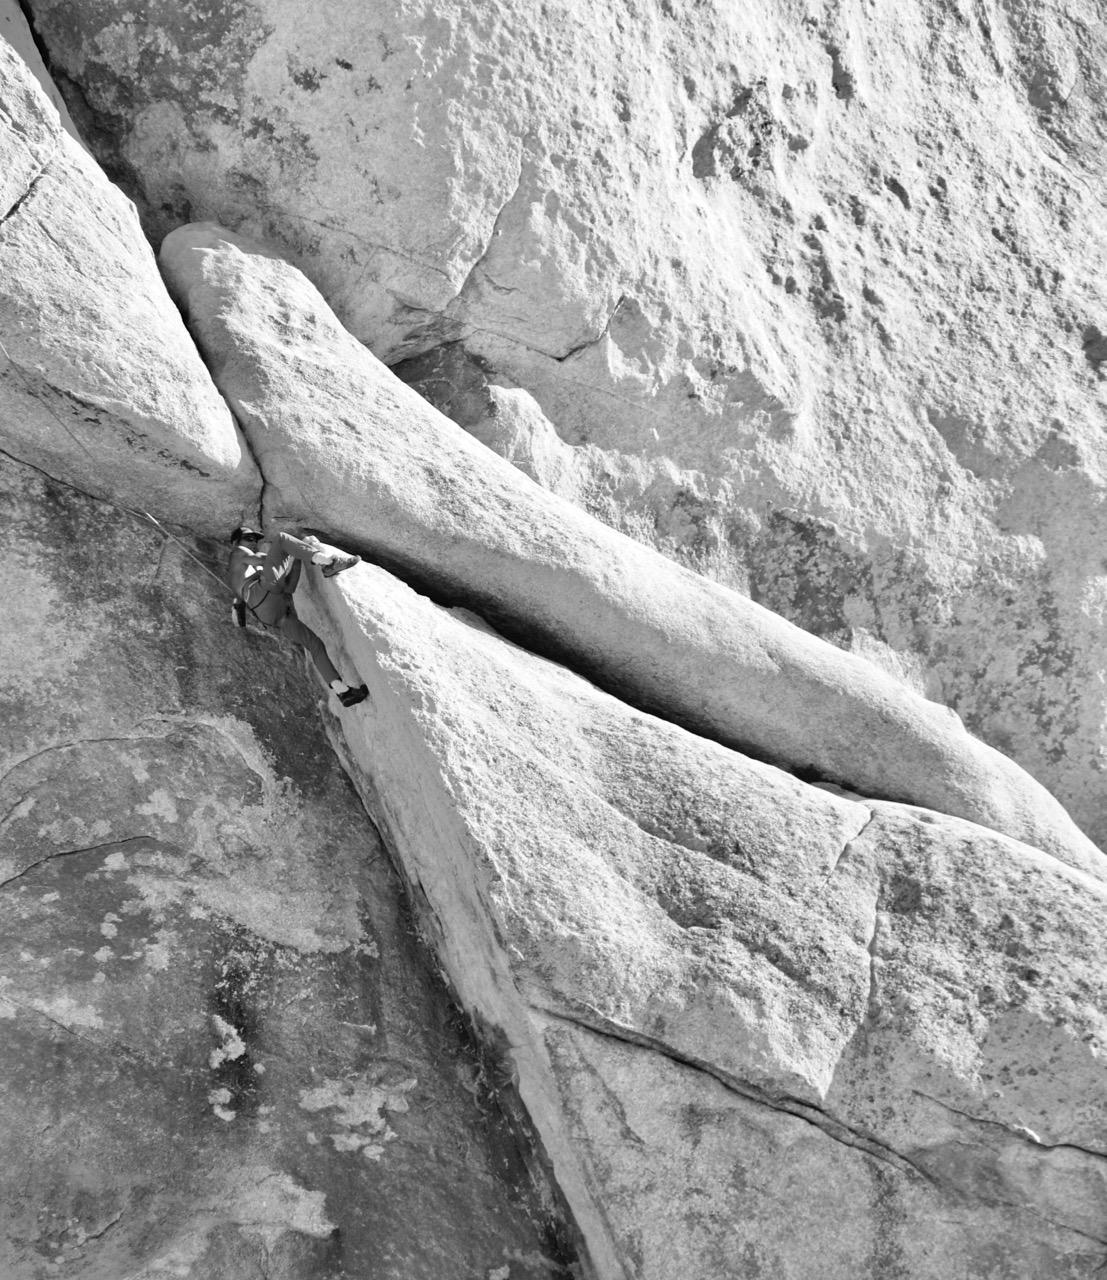 Morning Climb, Cap Rock - Joshua Tree National Park